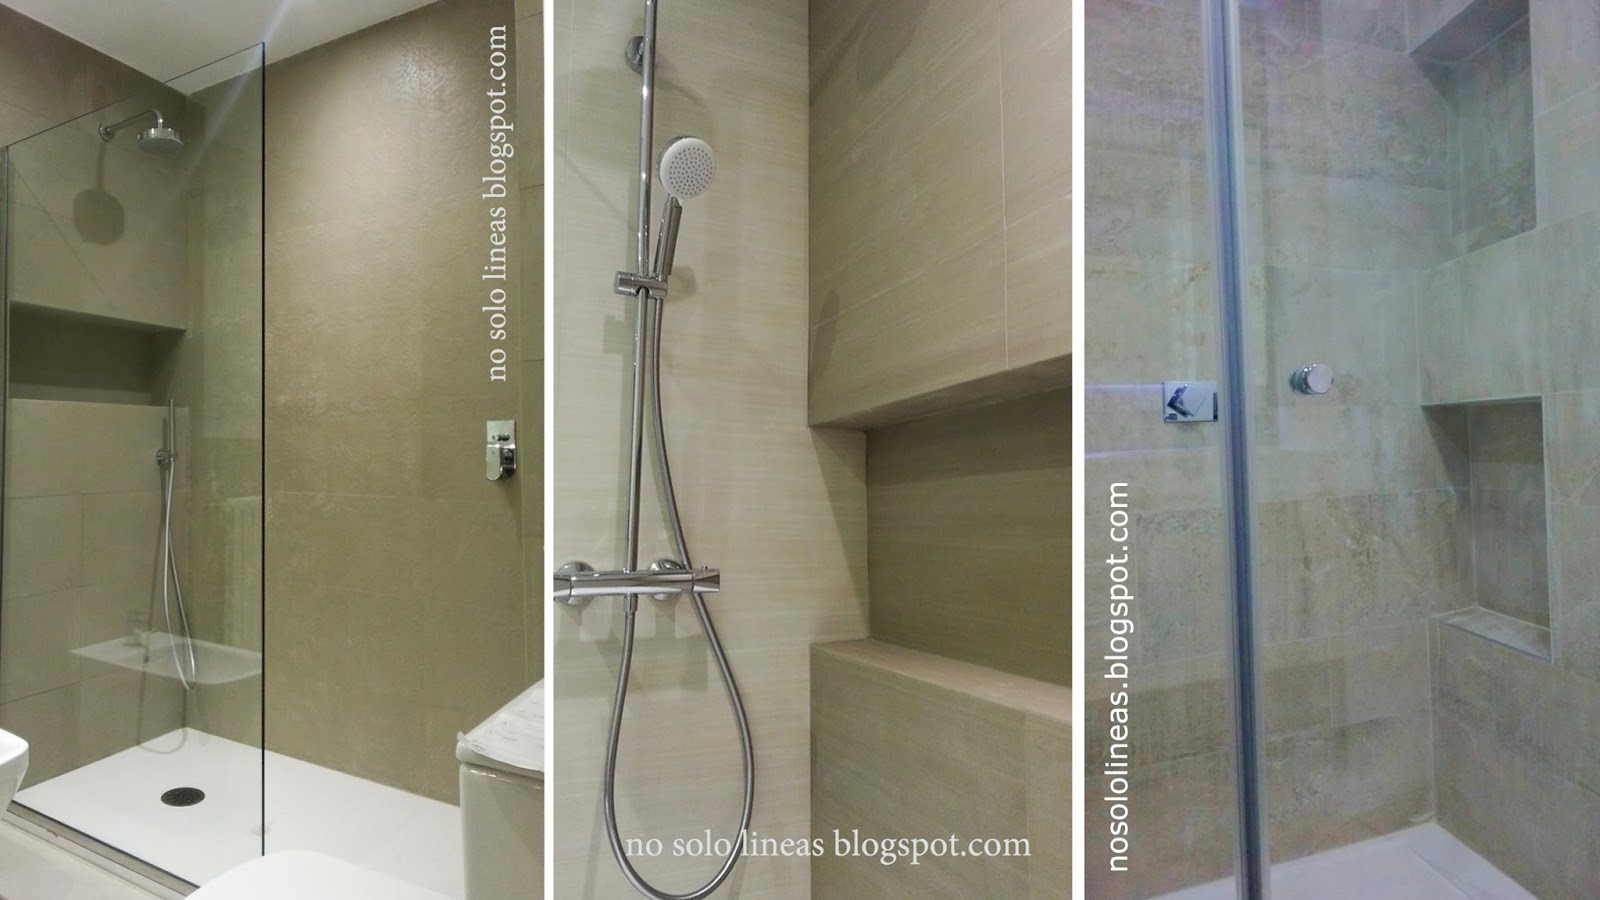 Hora de la ducha - 2 8